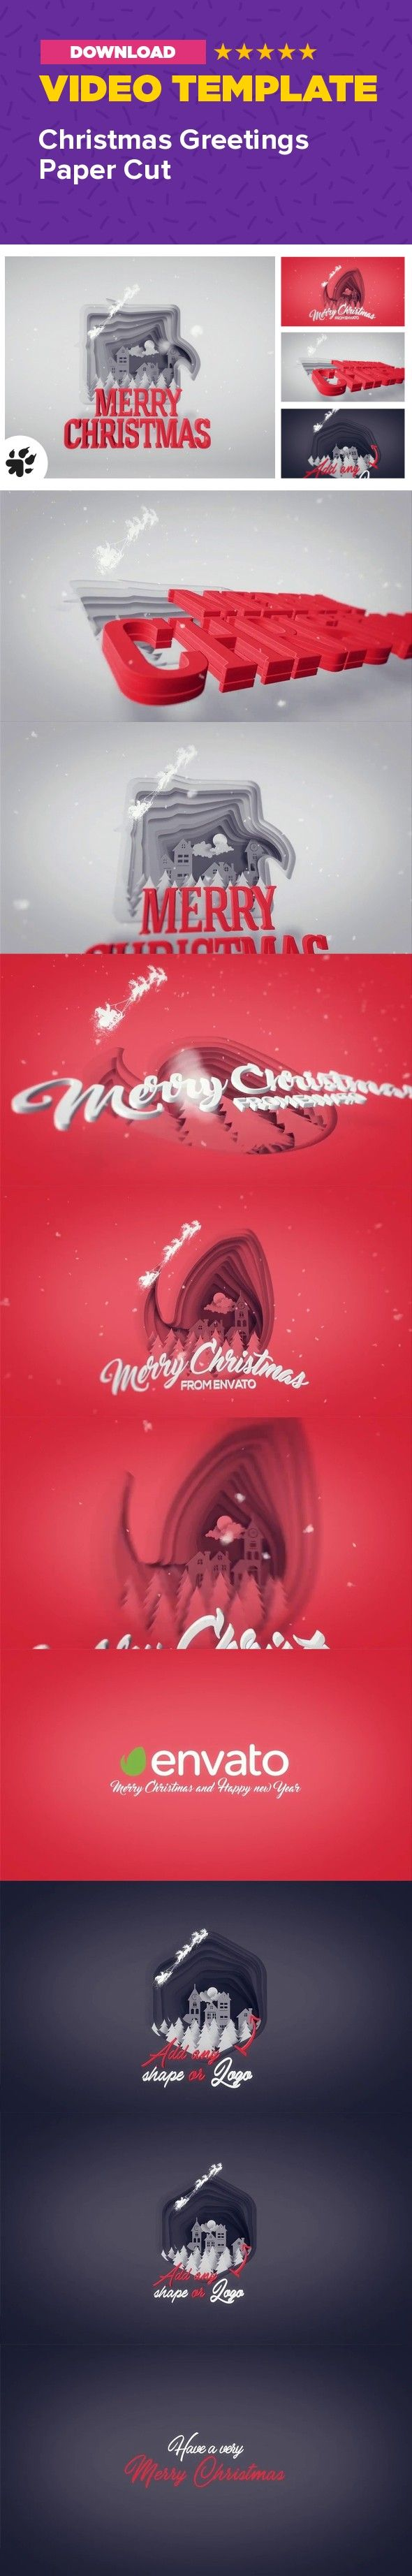 celebration, christmas, elegant, greetings, holliday, intro, logo, magical, merry christmas, opener, paper, seasons, snow, wishes, xmas ricardo, greetings, happy new year, holiday, logo, magical, merry christmas, pop up, present, snow, xmas,  3d, animation, card, cartoon, character, christmas, claus, magic, santa, sky, star, winter, xmas, corporate, epic, film, greeting, holidays, ident, intro, movie, season, stylish, titles, trailer, 3d intro, countdown, opener, snowflake, celebration…